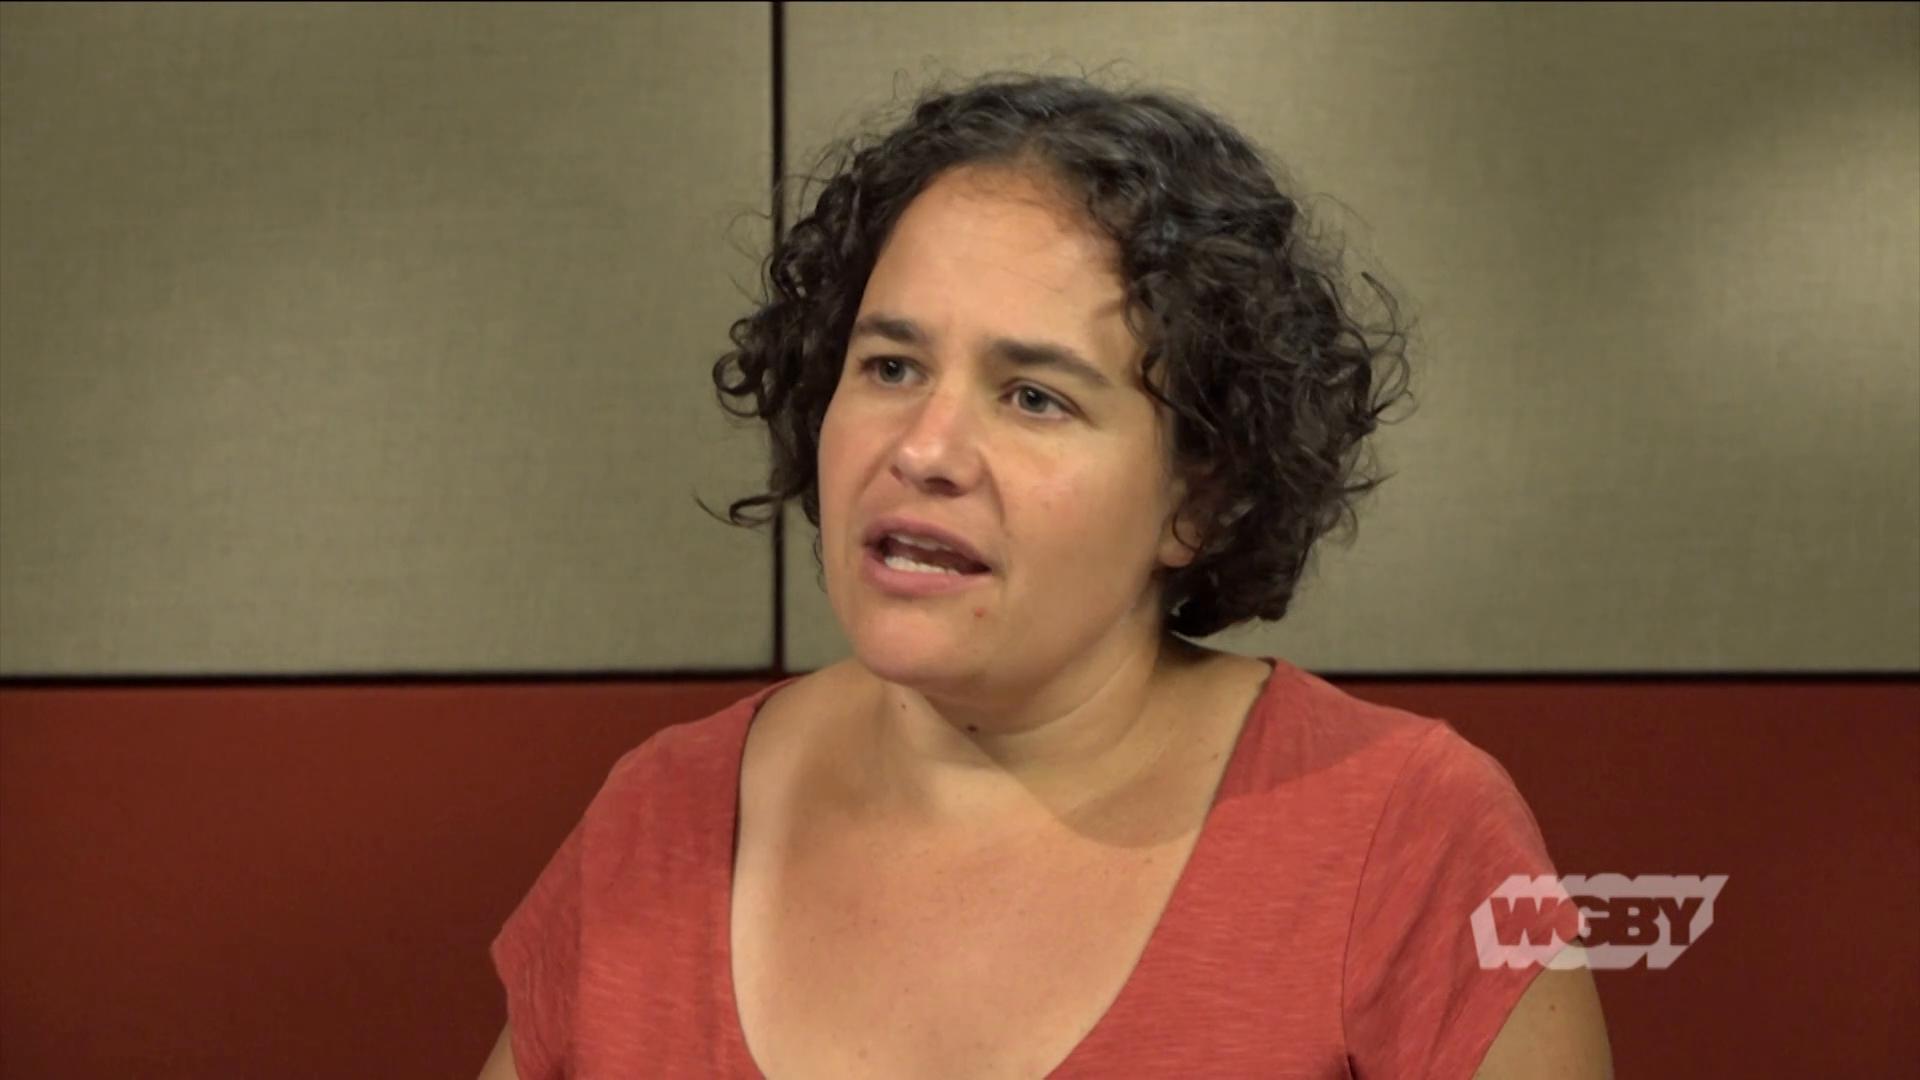 Volunteers in Medicine Berkshires' Ilhanna Steinhauser discusses how case management helps treat a patient's socioeconomic, environmental, & medical needs.